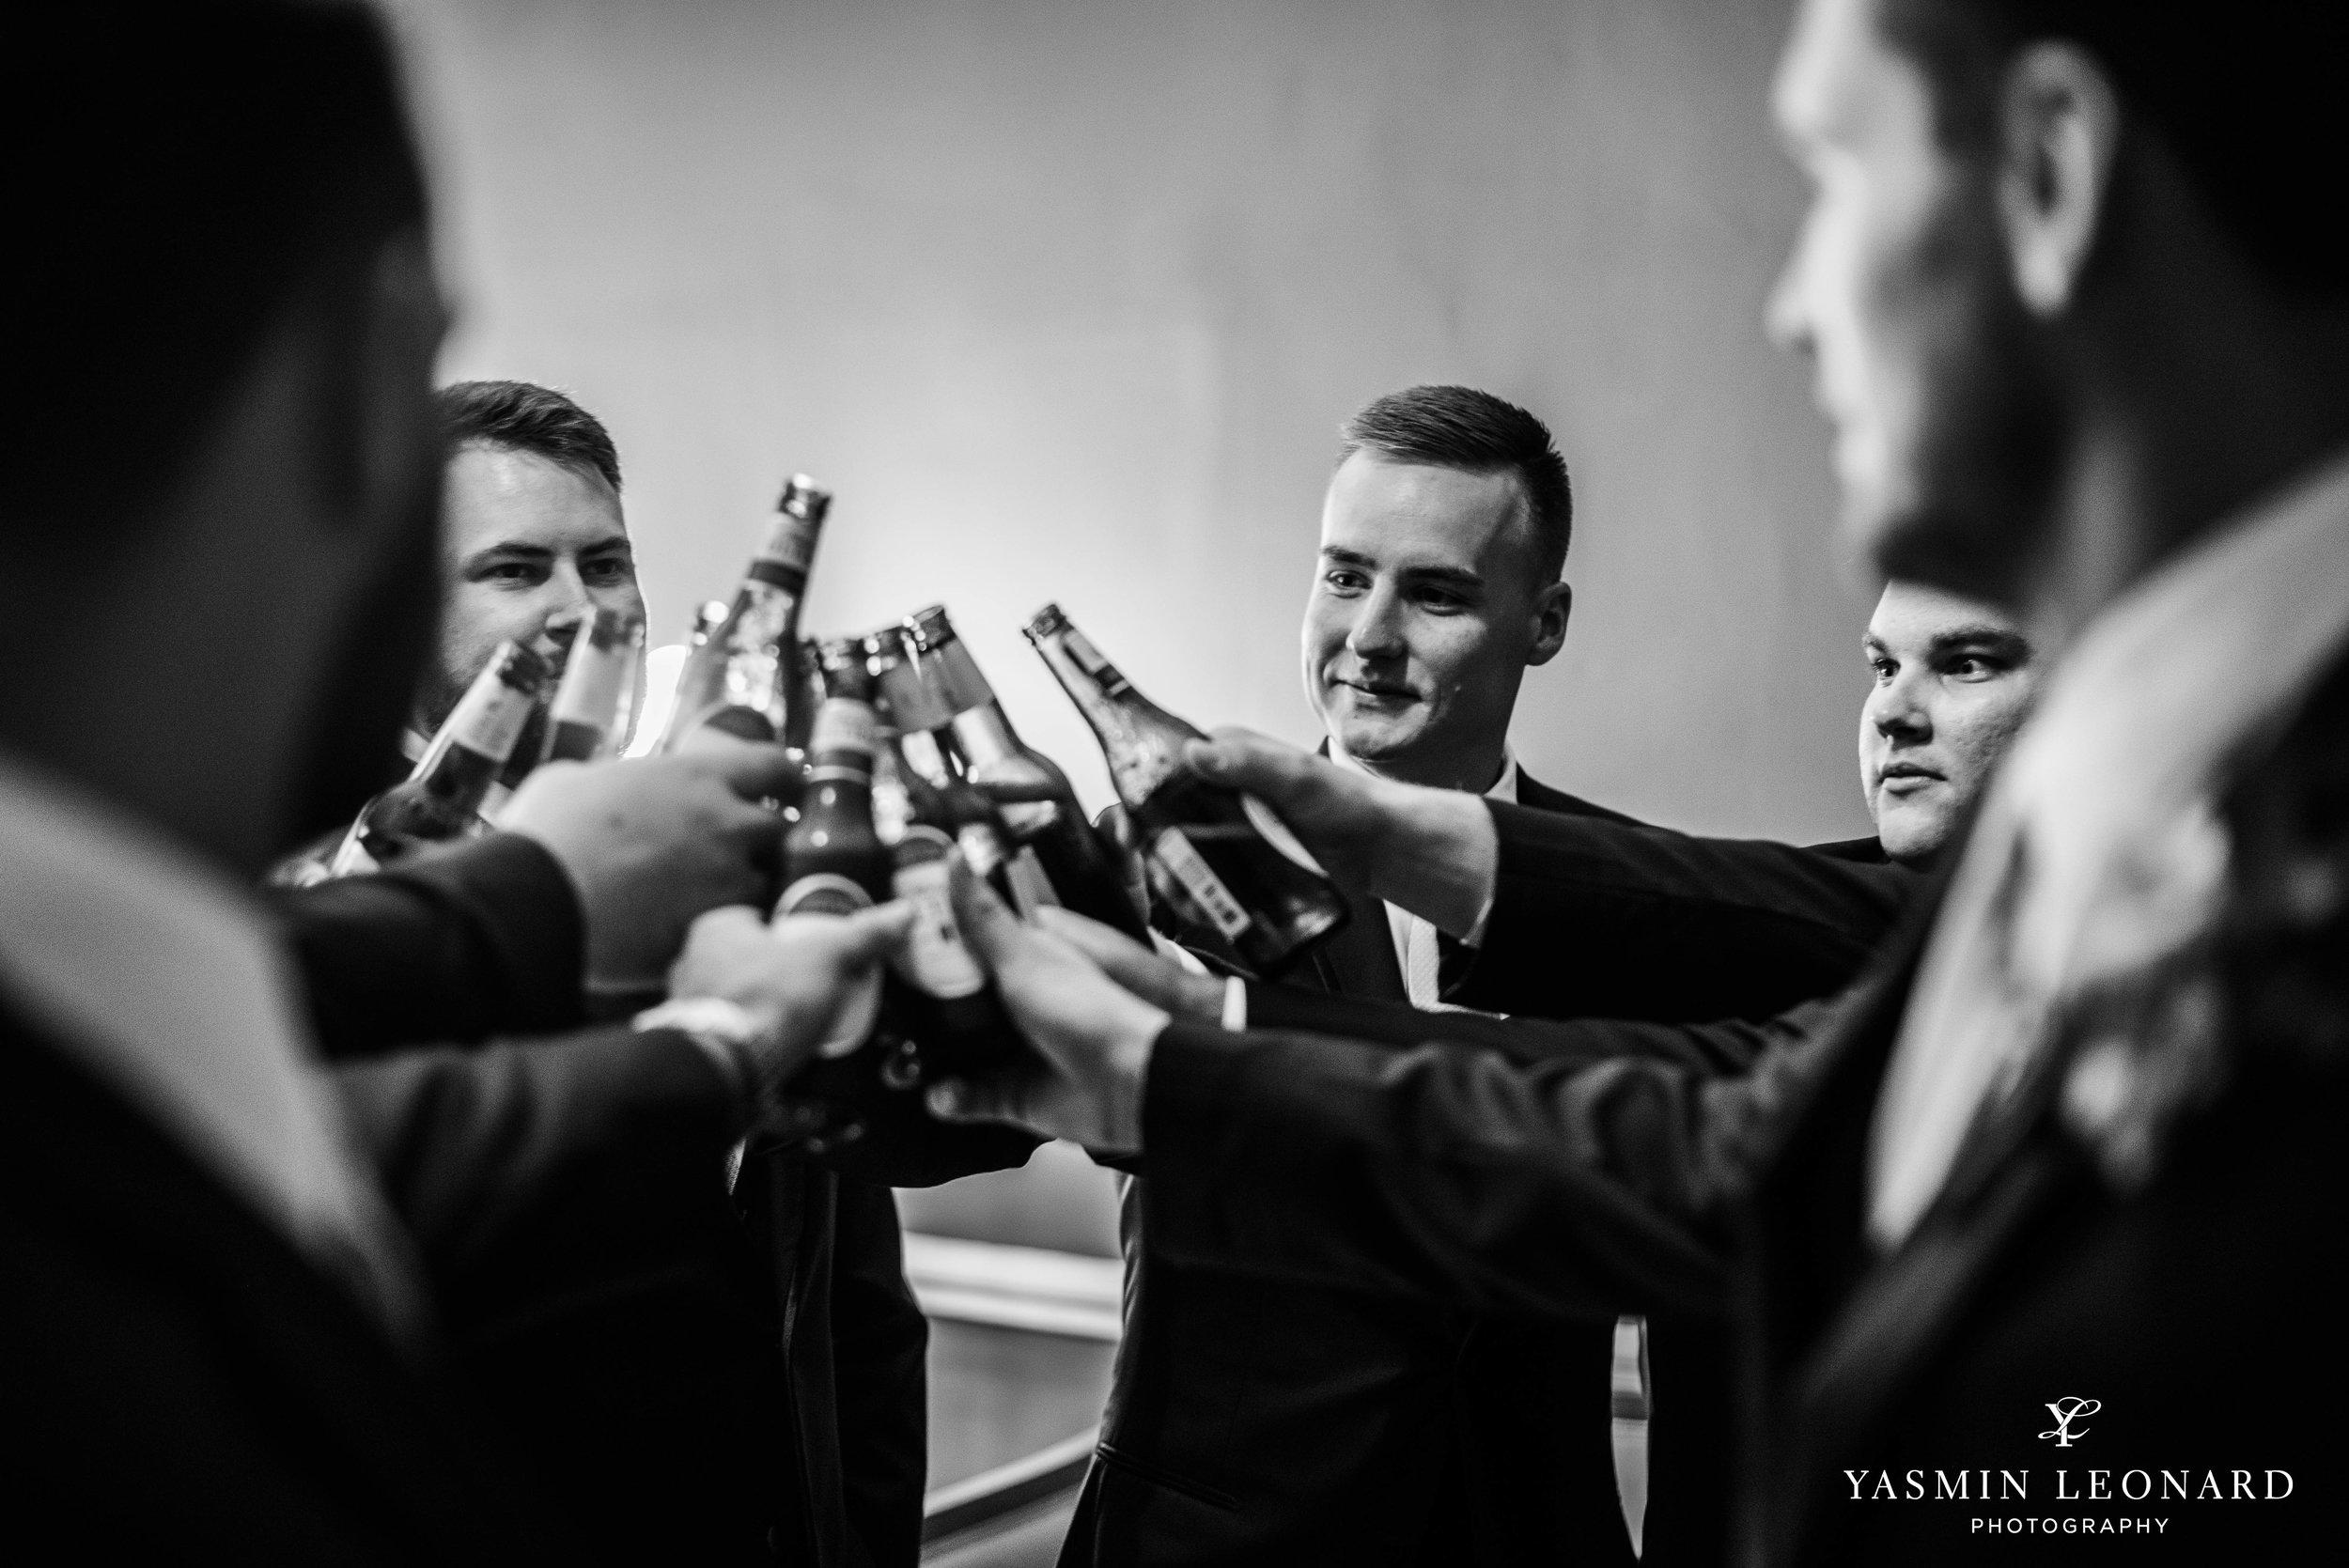 Separk Mansion - NC Weddings - Gastonia Wedding - NC Wedding Venues - Pink and Blue Wedding Ideas - Pink Bridesmaid Dresses - Yasmin Leonard Photography-13.jpg